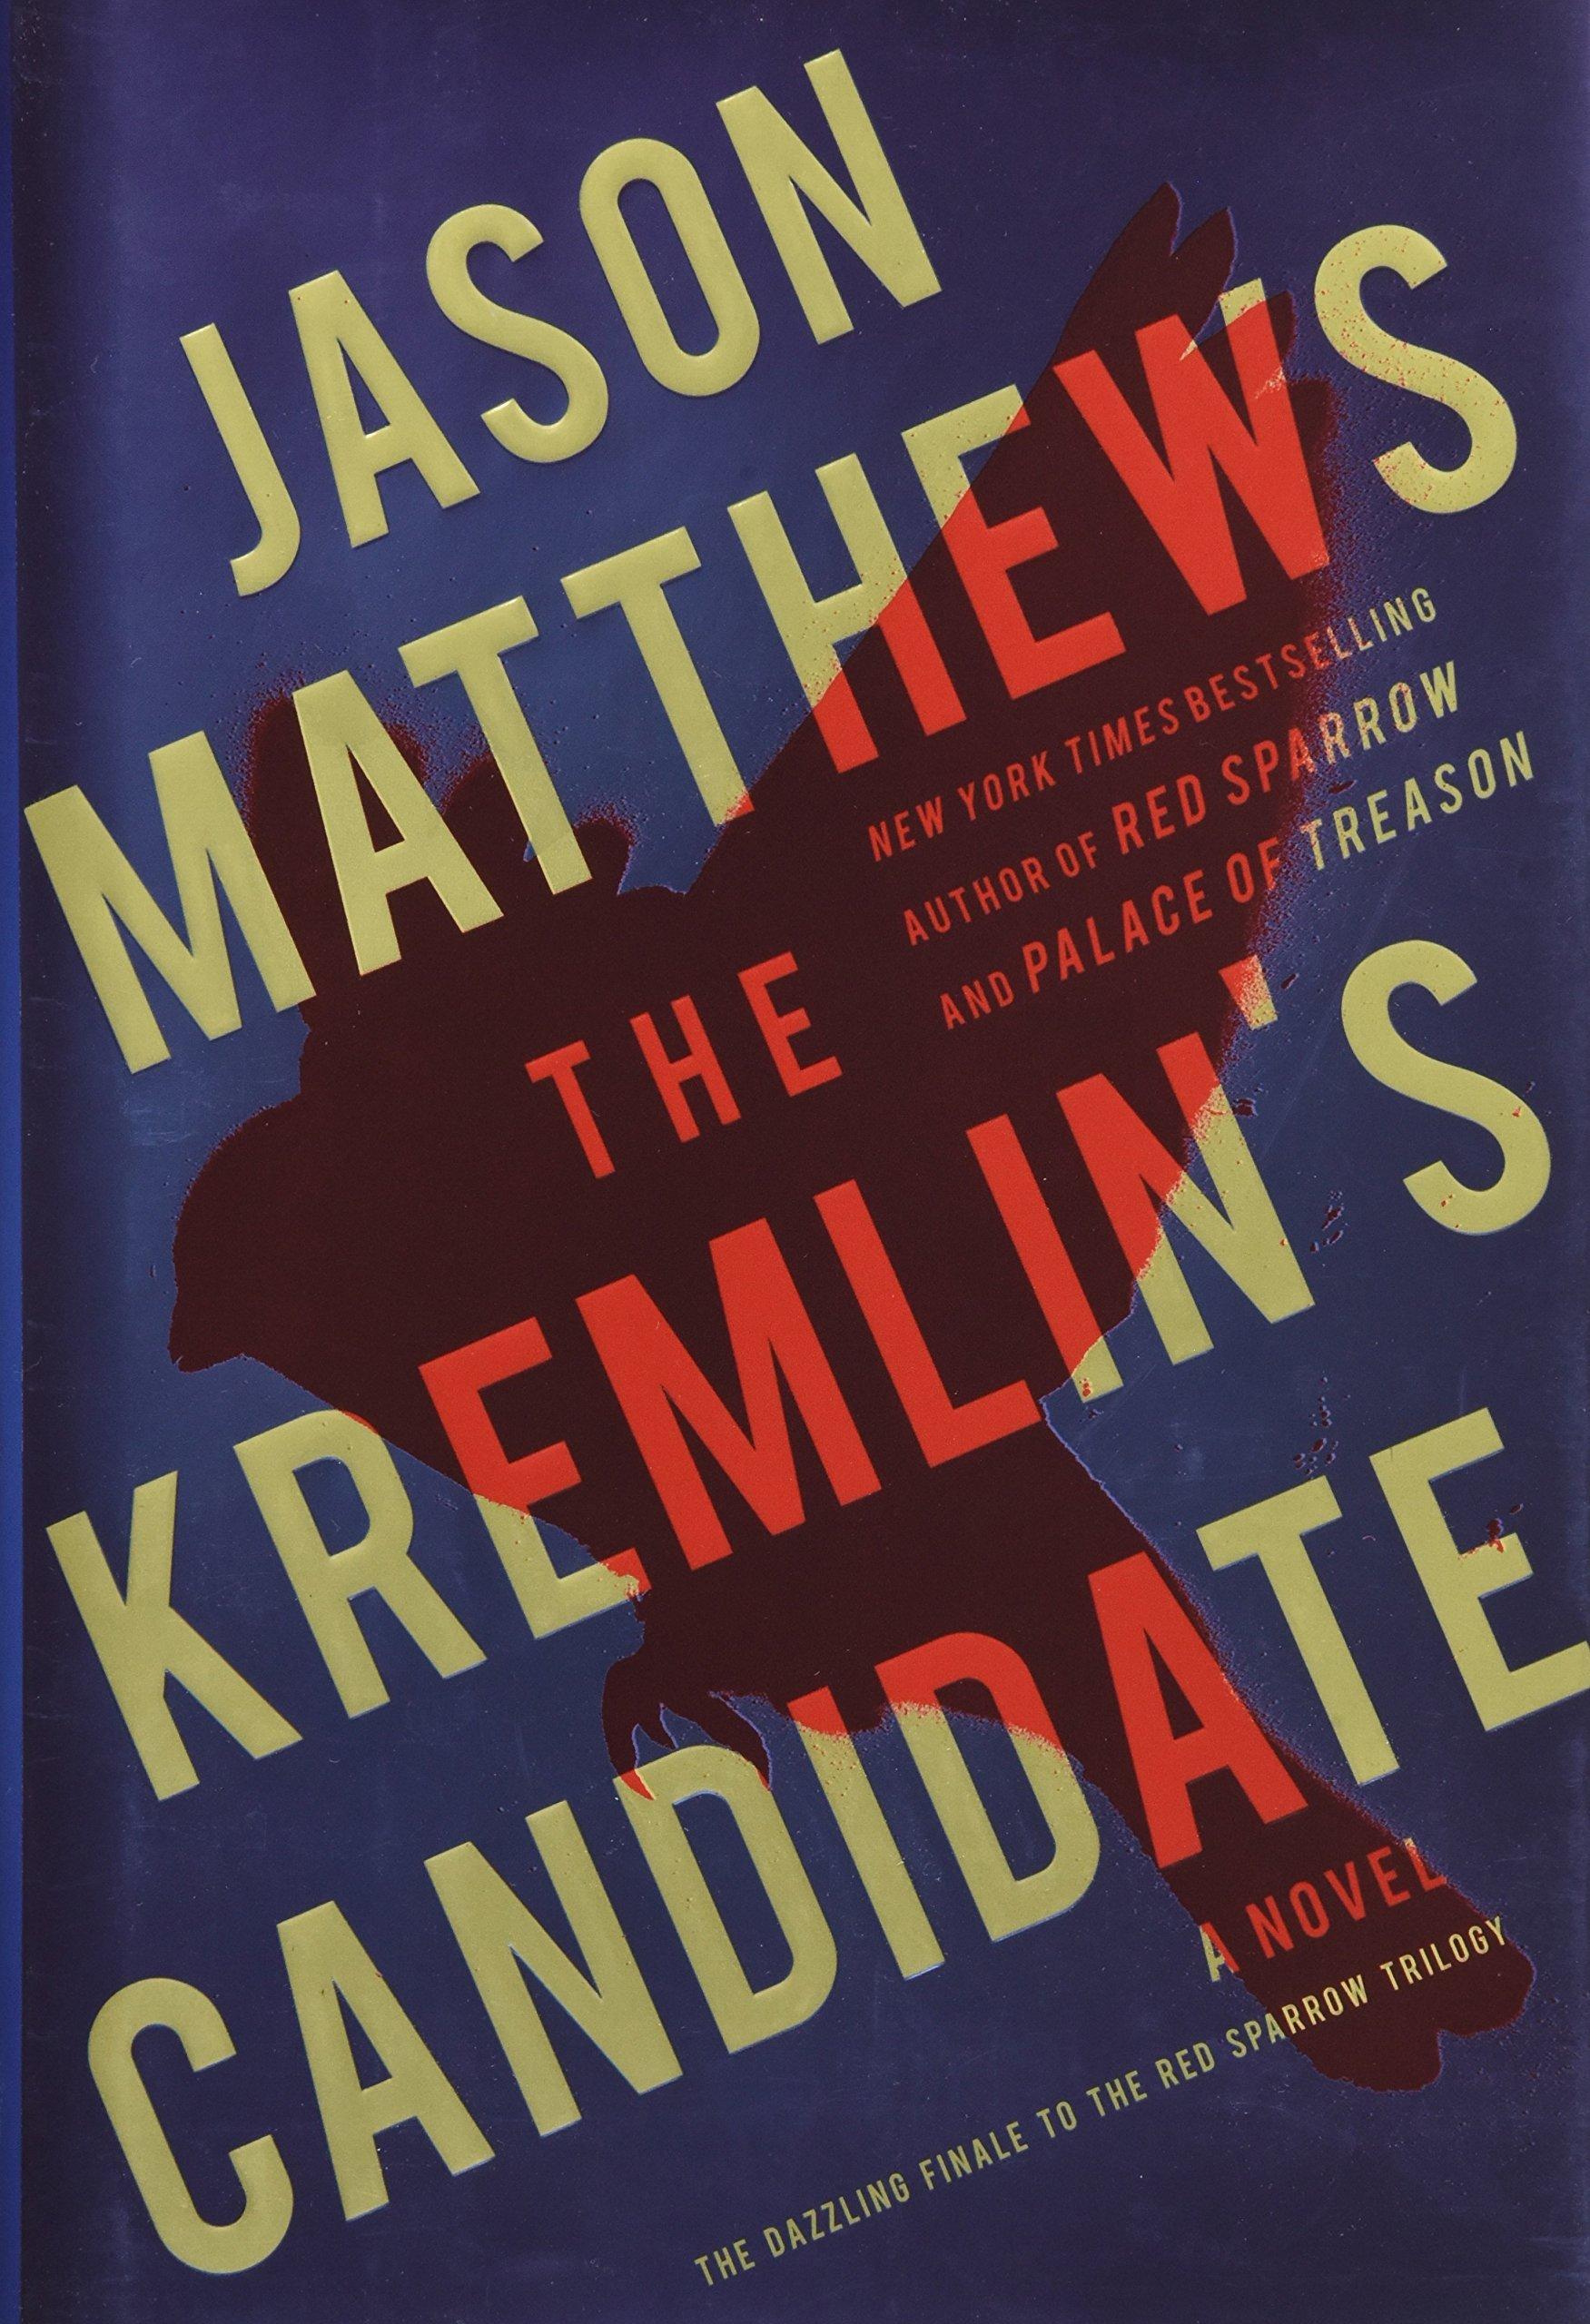 The Kremlin's Candidate: A Novel Volume 3 The Red Sparrow Trilogy, Band 3:  Amazon.de: Matthews, Jason: Fremdsprachige Bücher